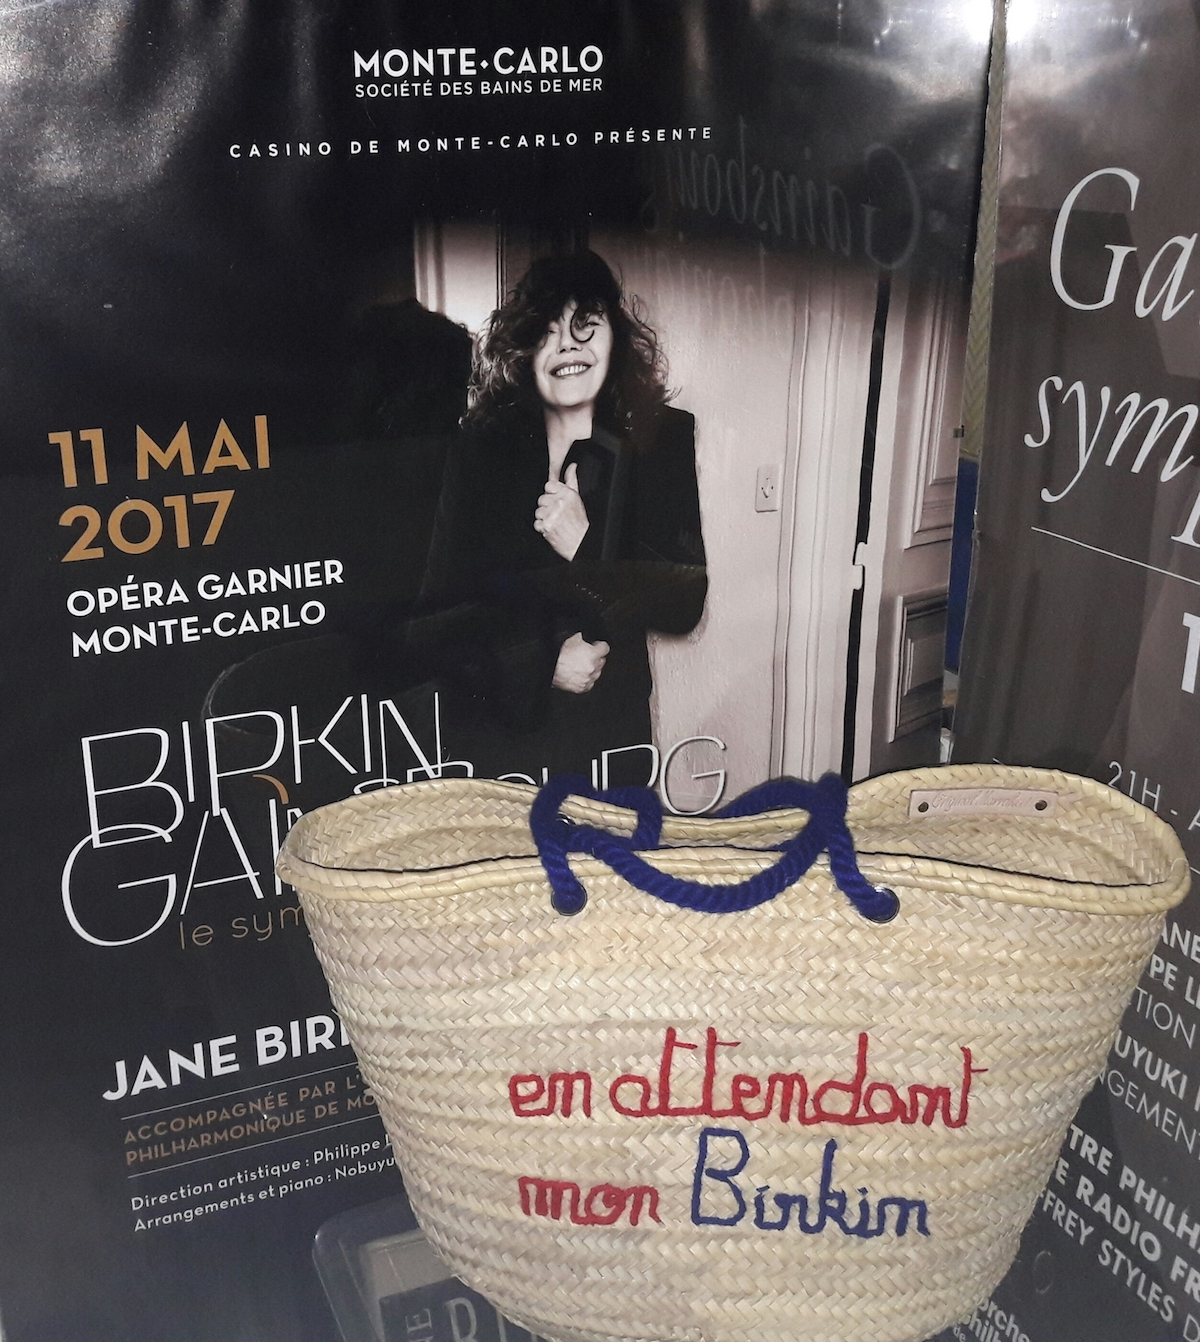 Jane birkin birkin bag concert monaco